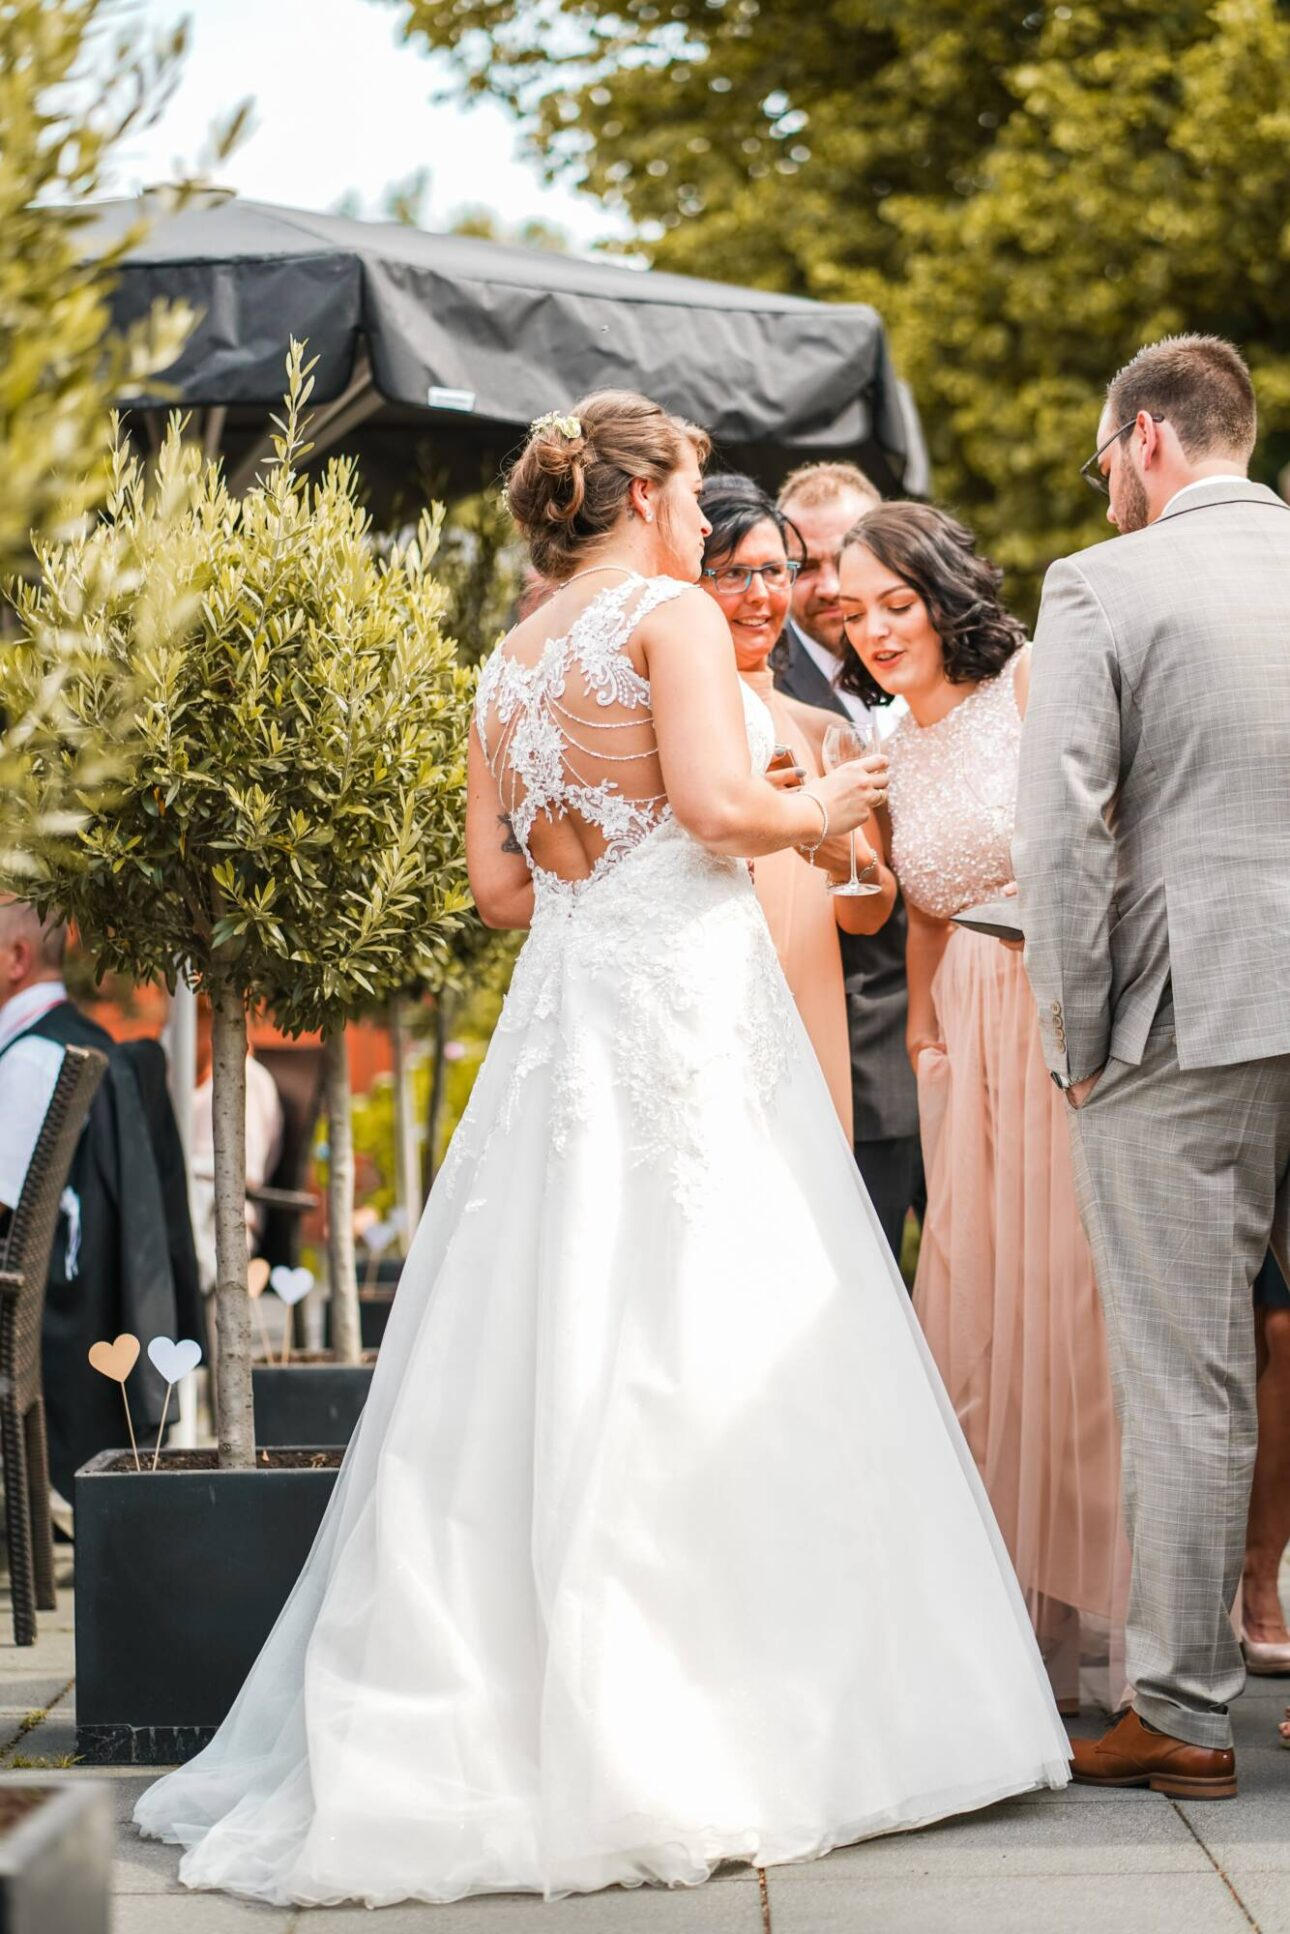 VanessaJoshua20_Hochzeitsfotograf_Koeln